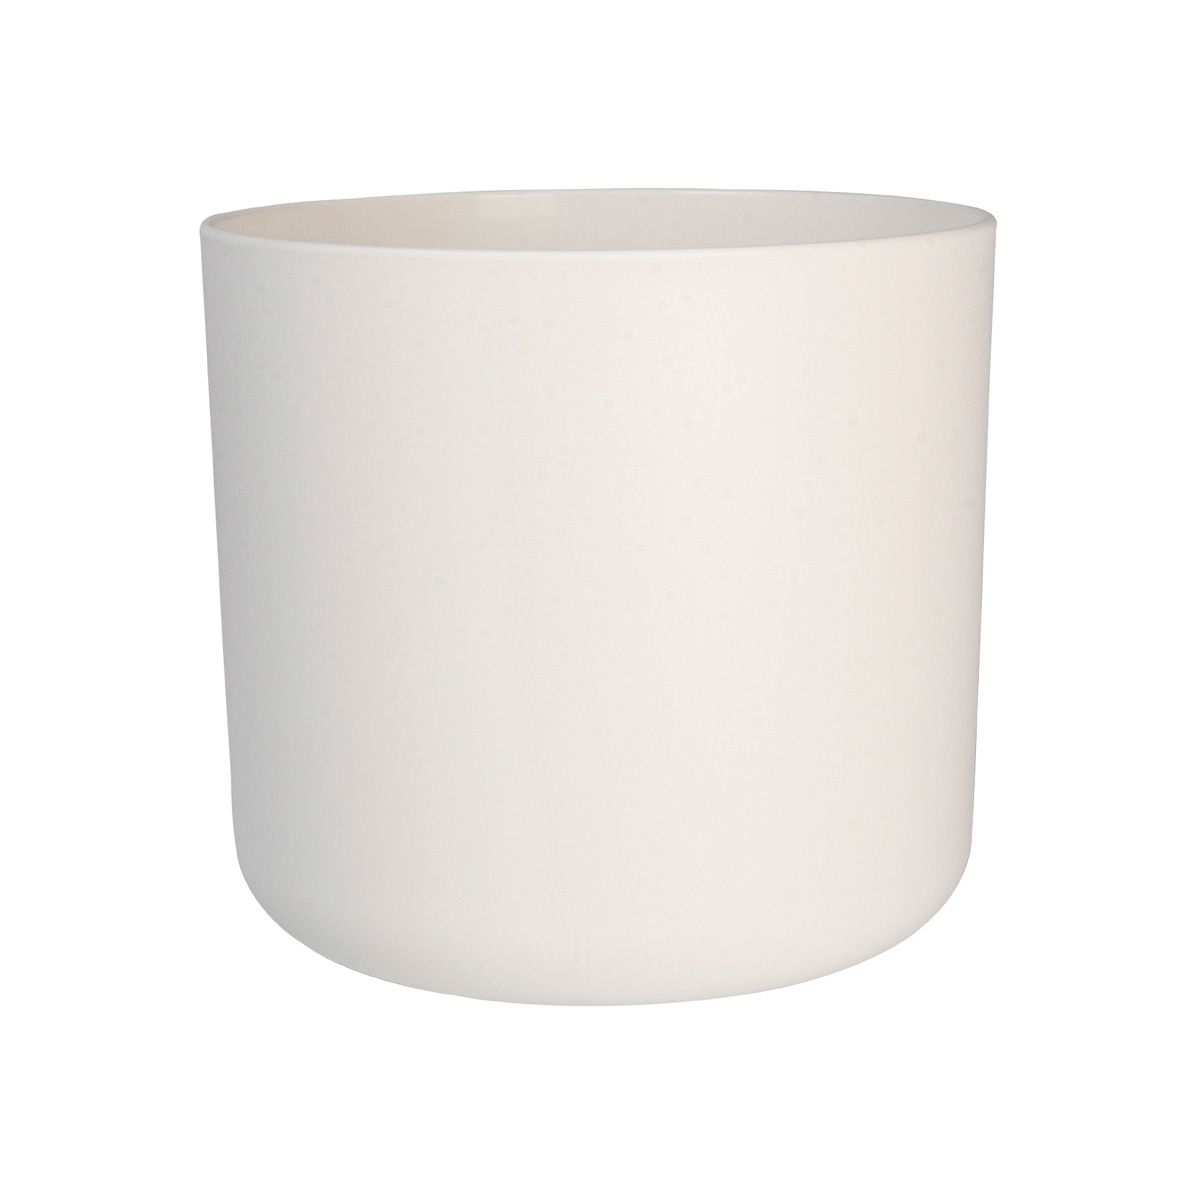 Bloembakken Buiten Intratuin.Elho B For Soft Pot Rond 35cm Wit Intratuin Roeterseiland